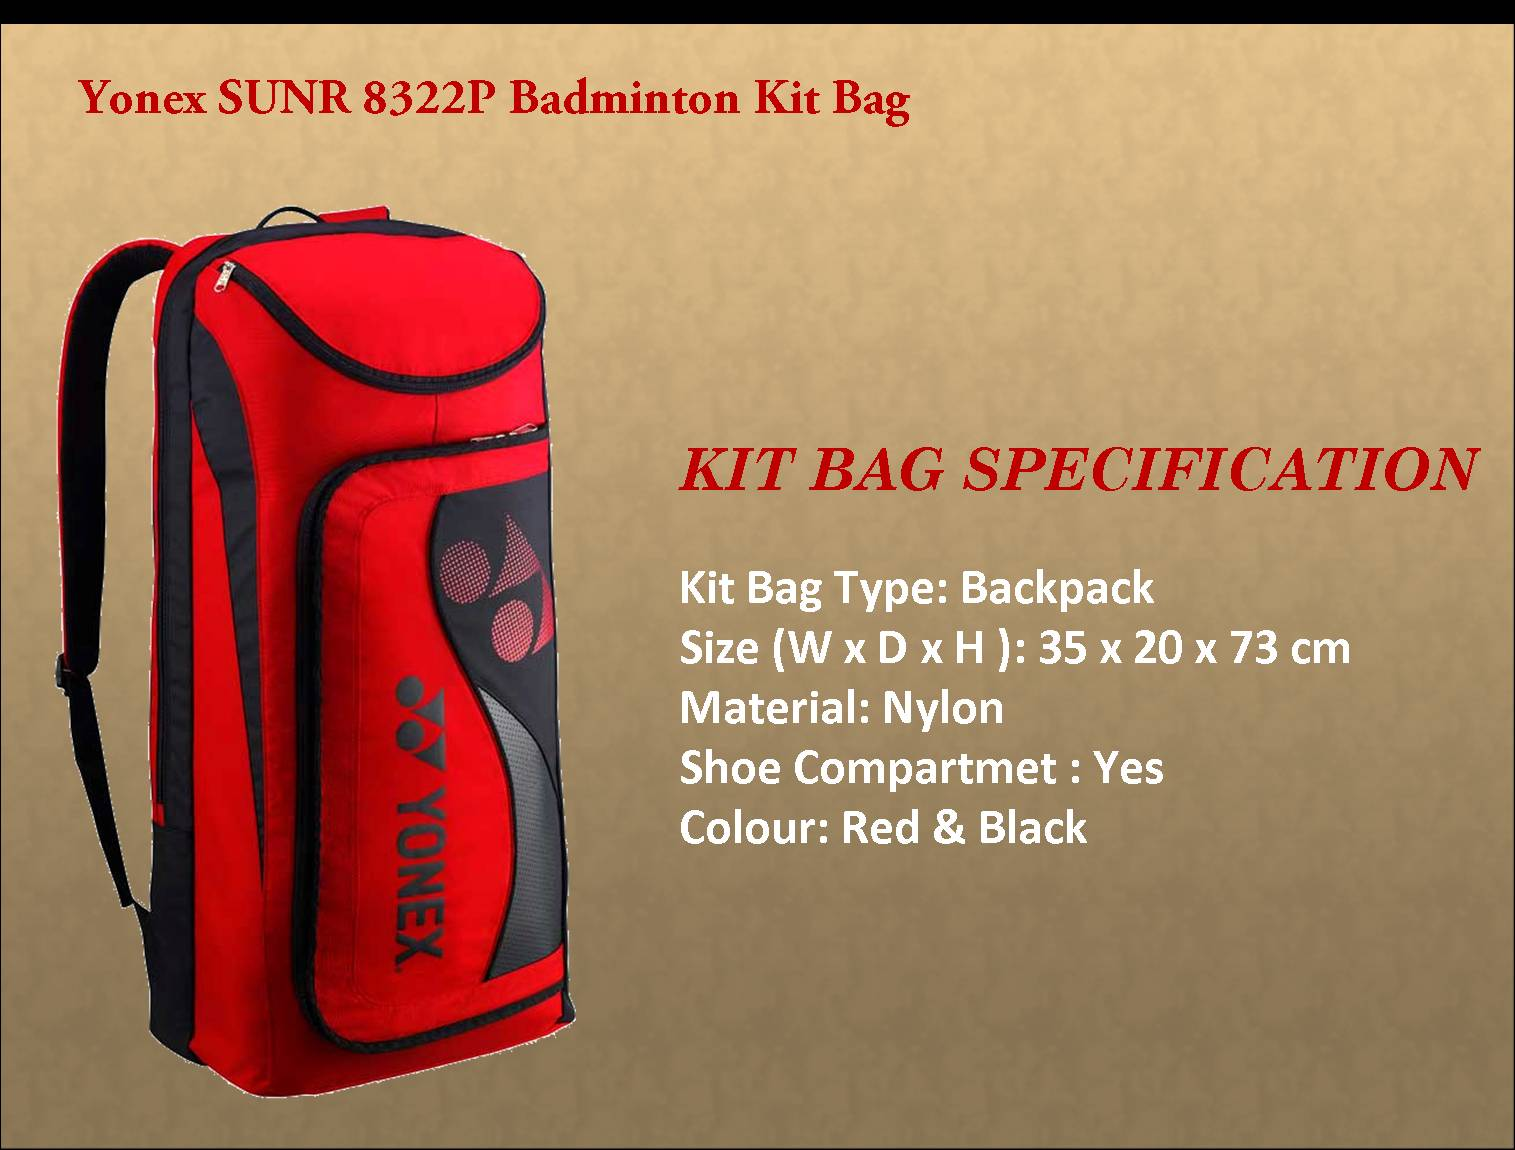 Yonex SUNR 8322P Badminton Kit Bag